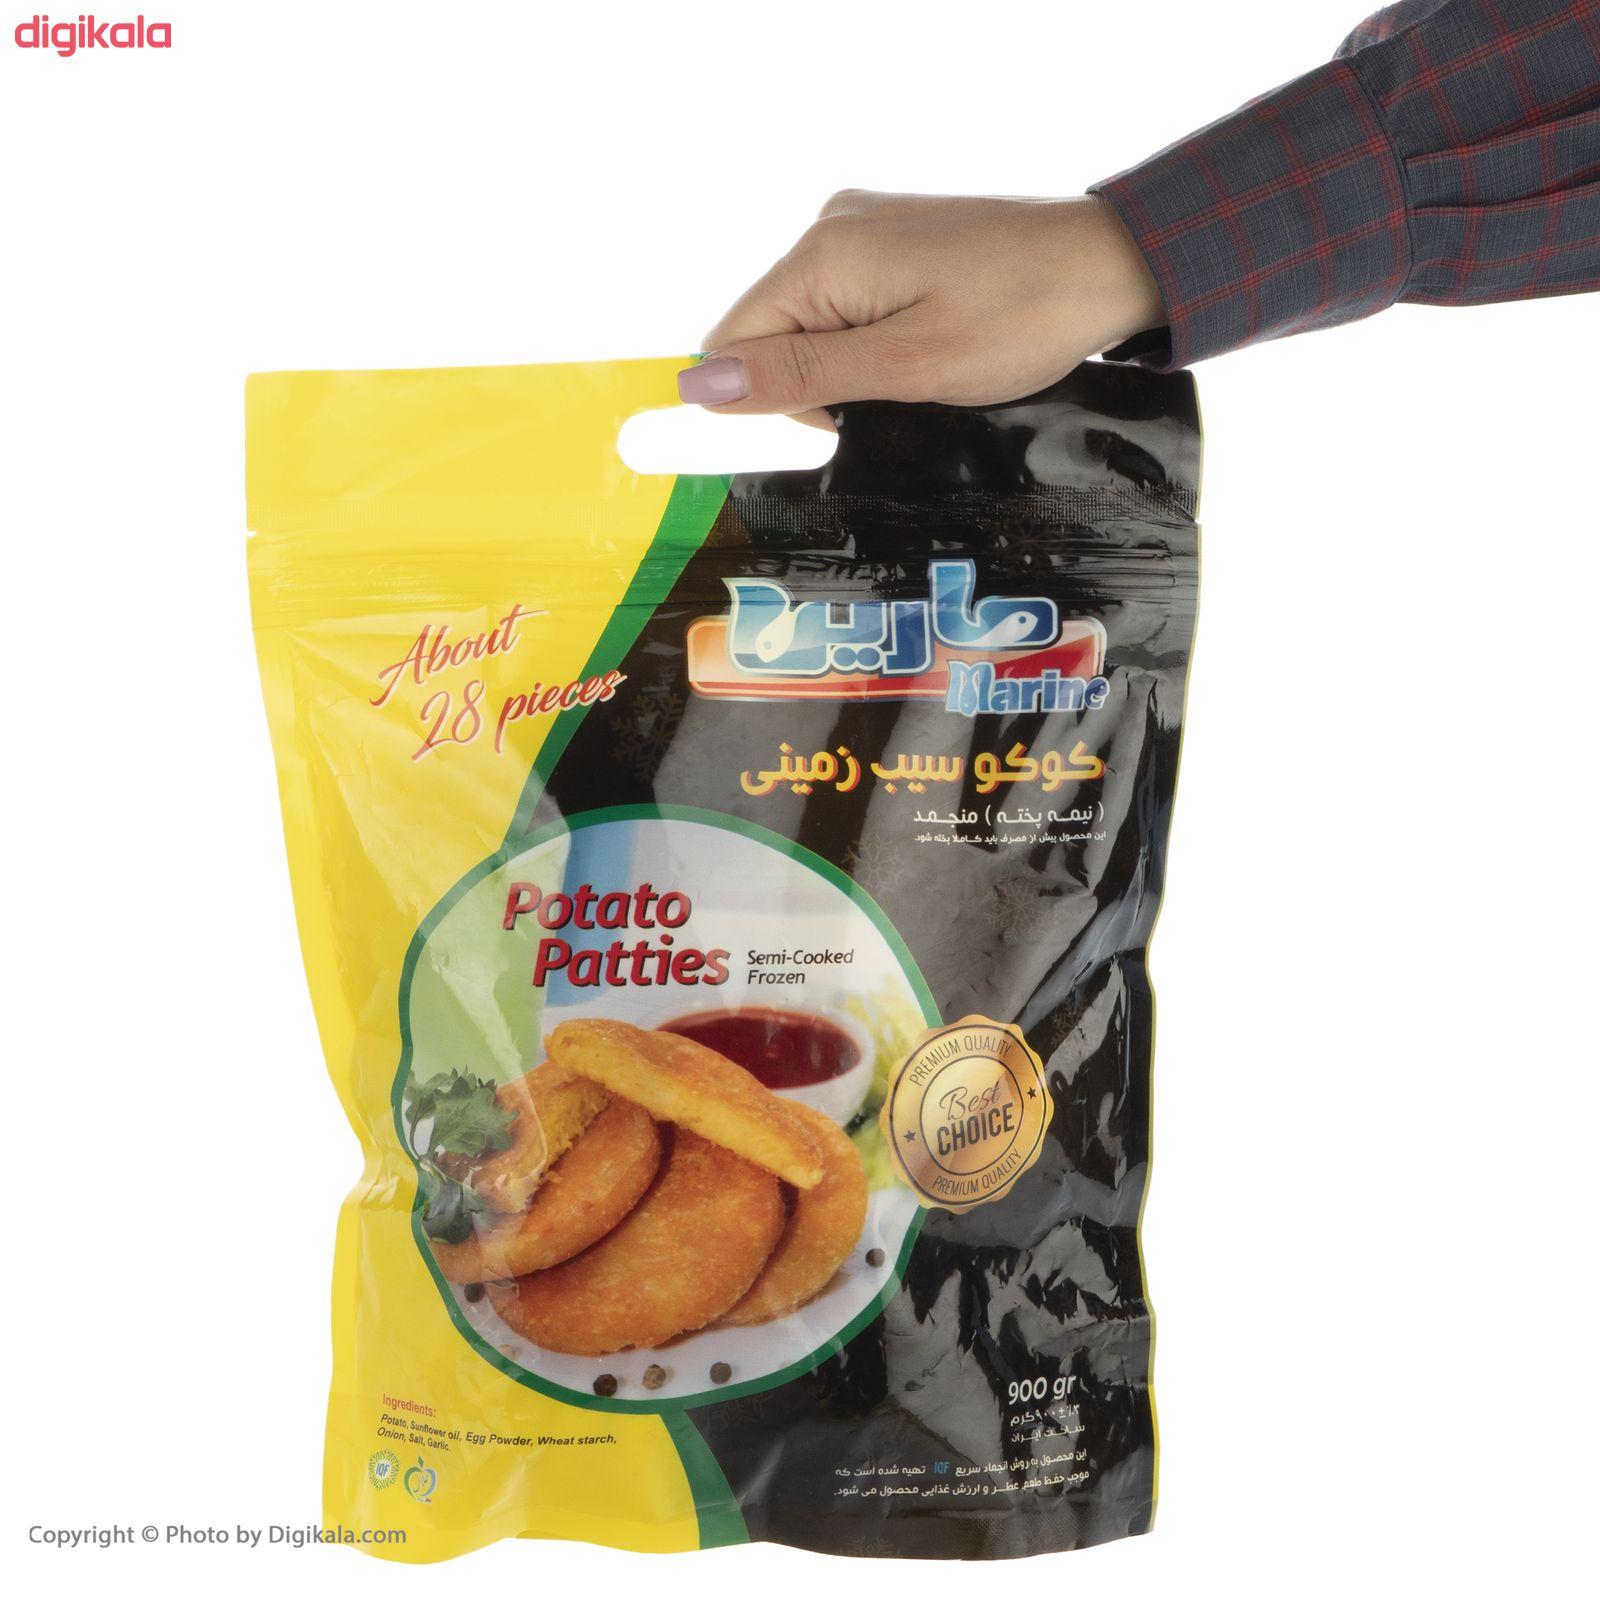 کوکو سیب زمینی مارین - 900 گرم  main 1 3